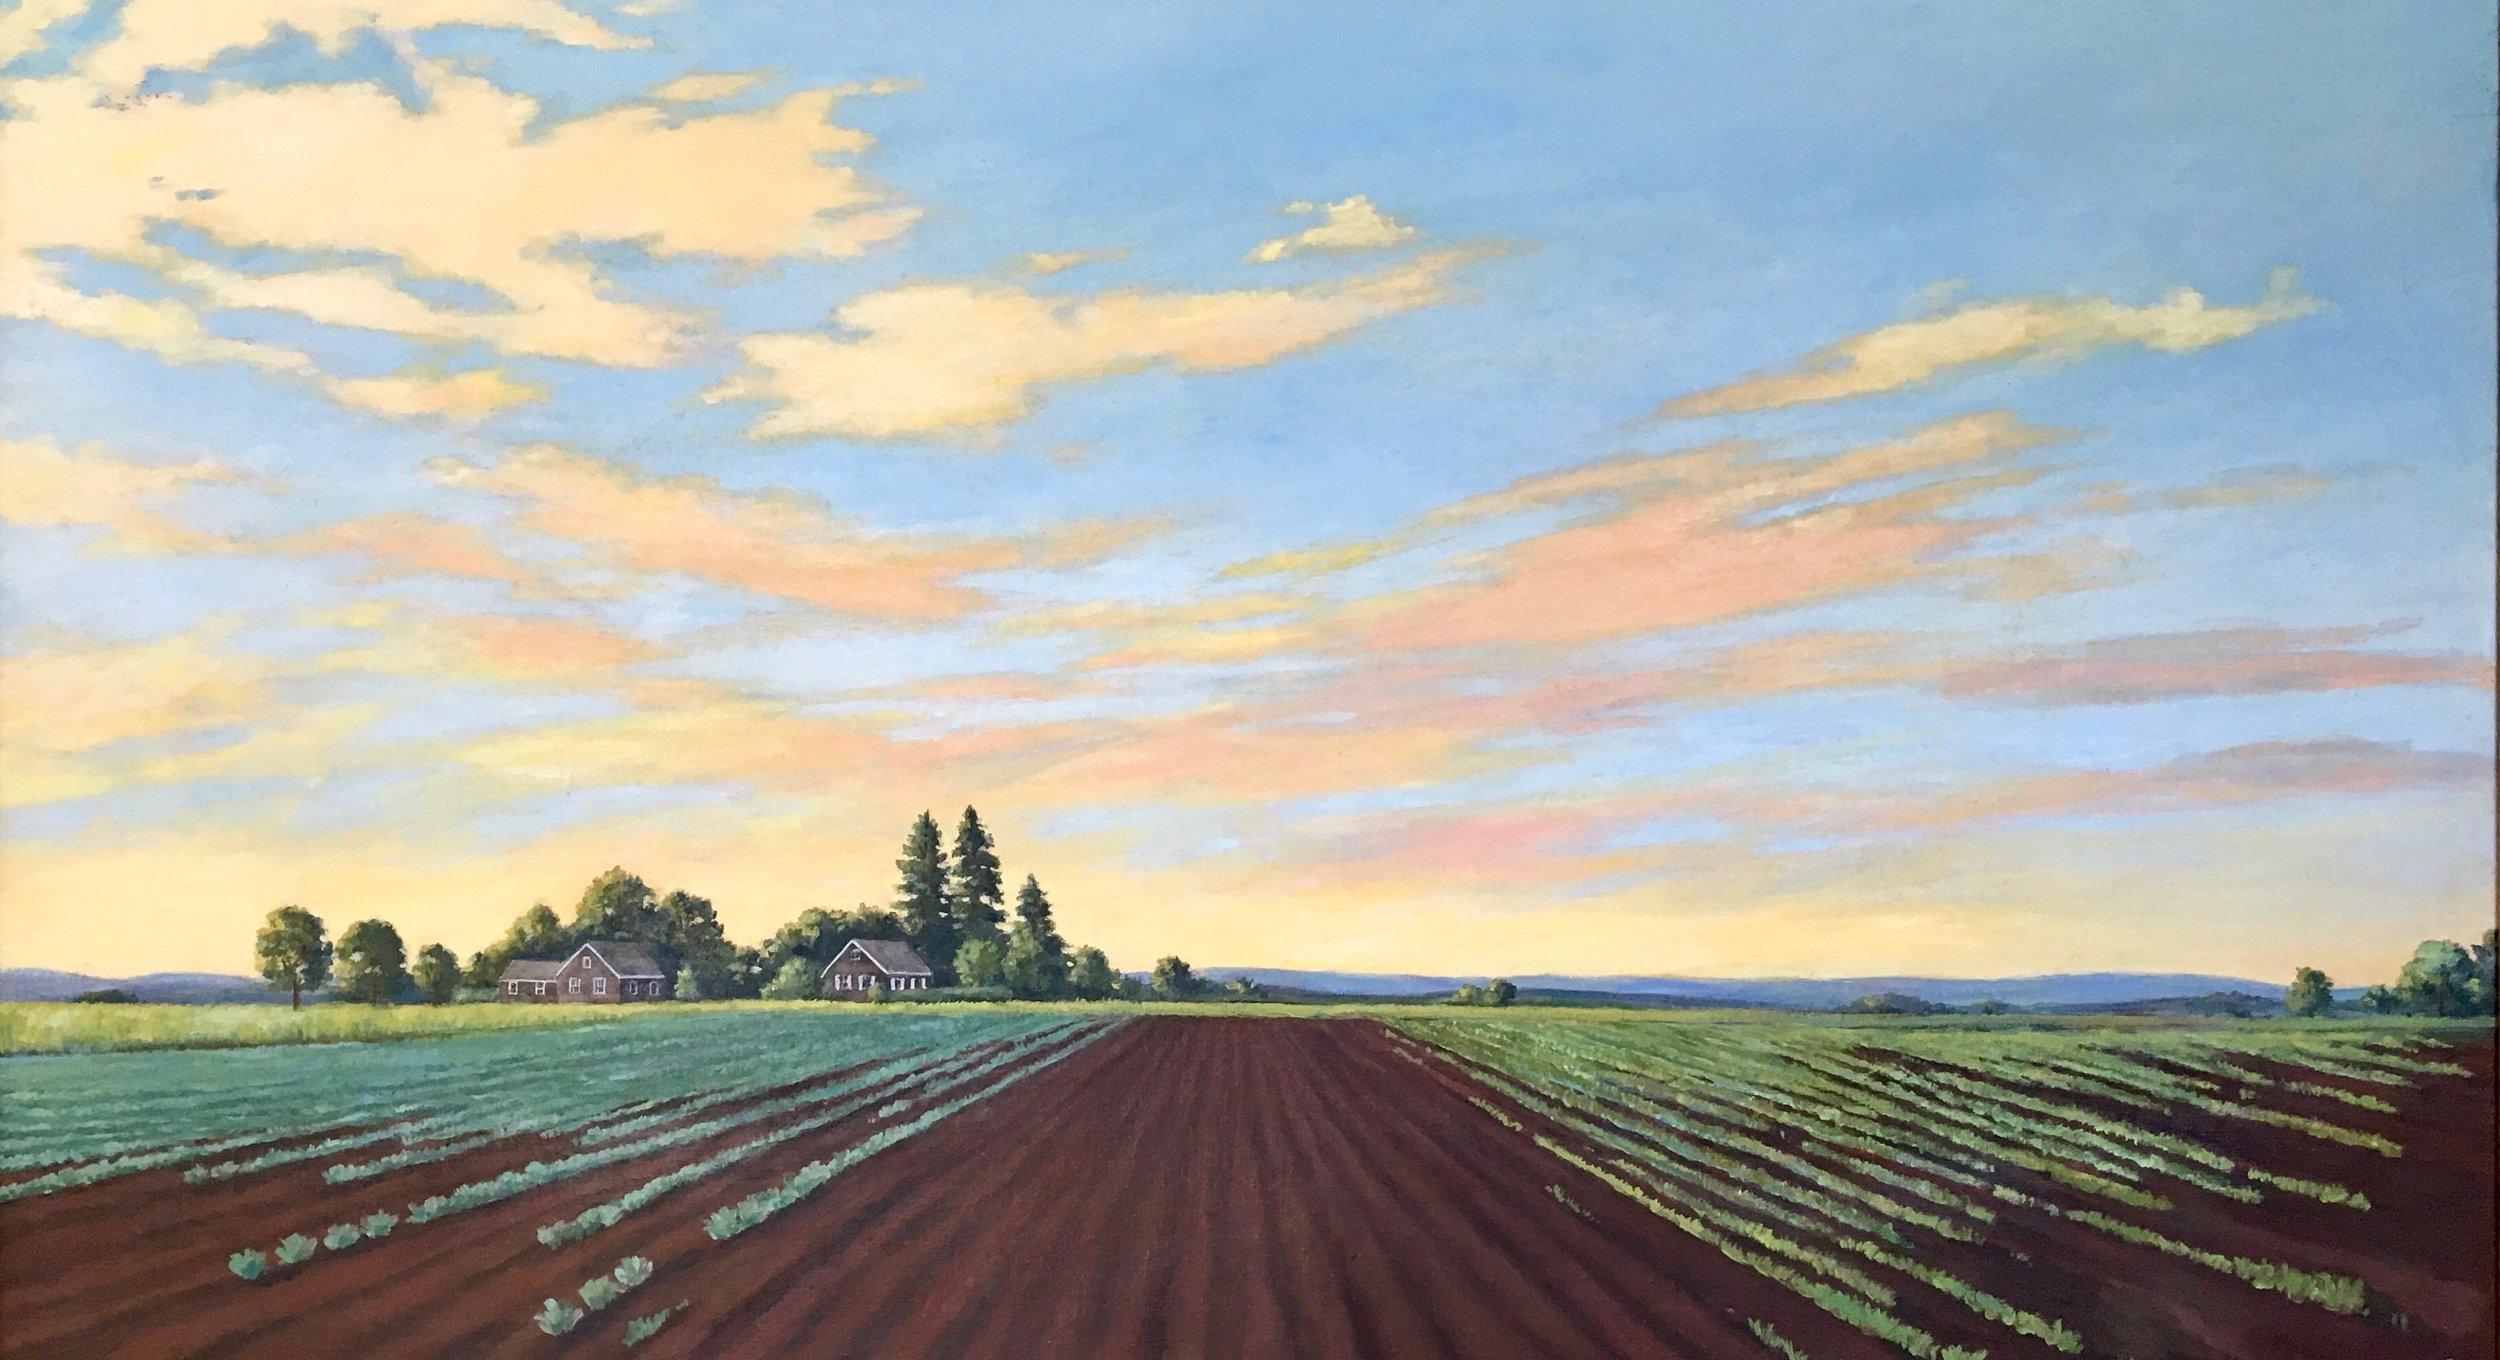 Scuttlehole, 2000, oil on canvas, 48 x 32 in, $4,800